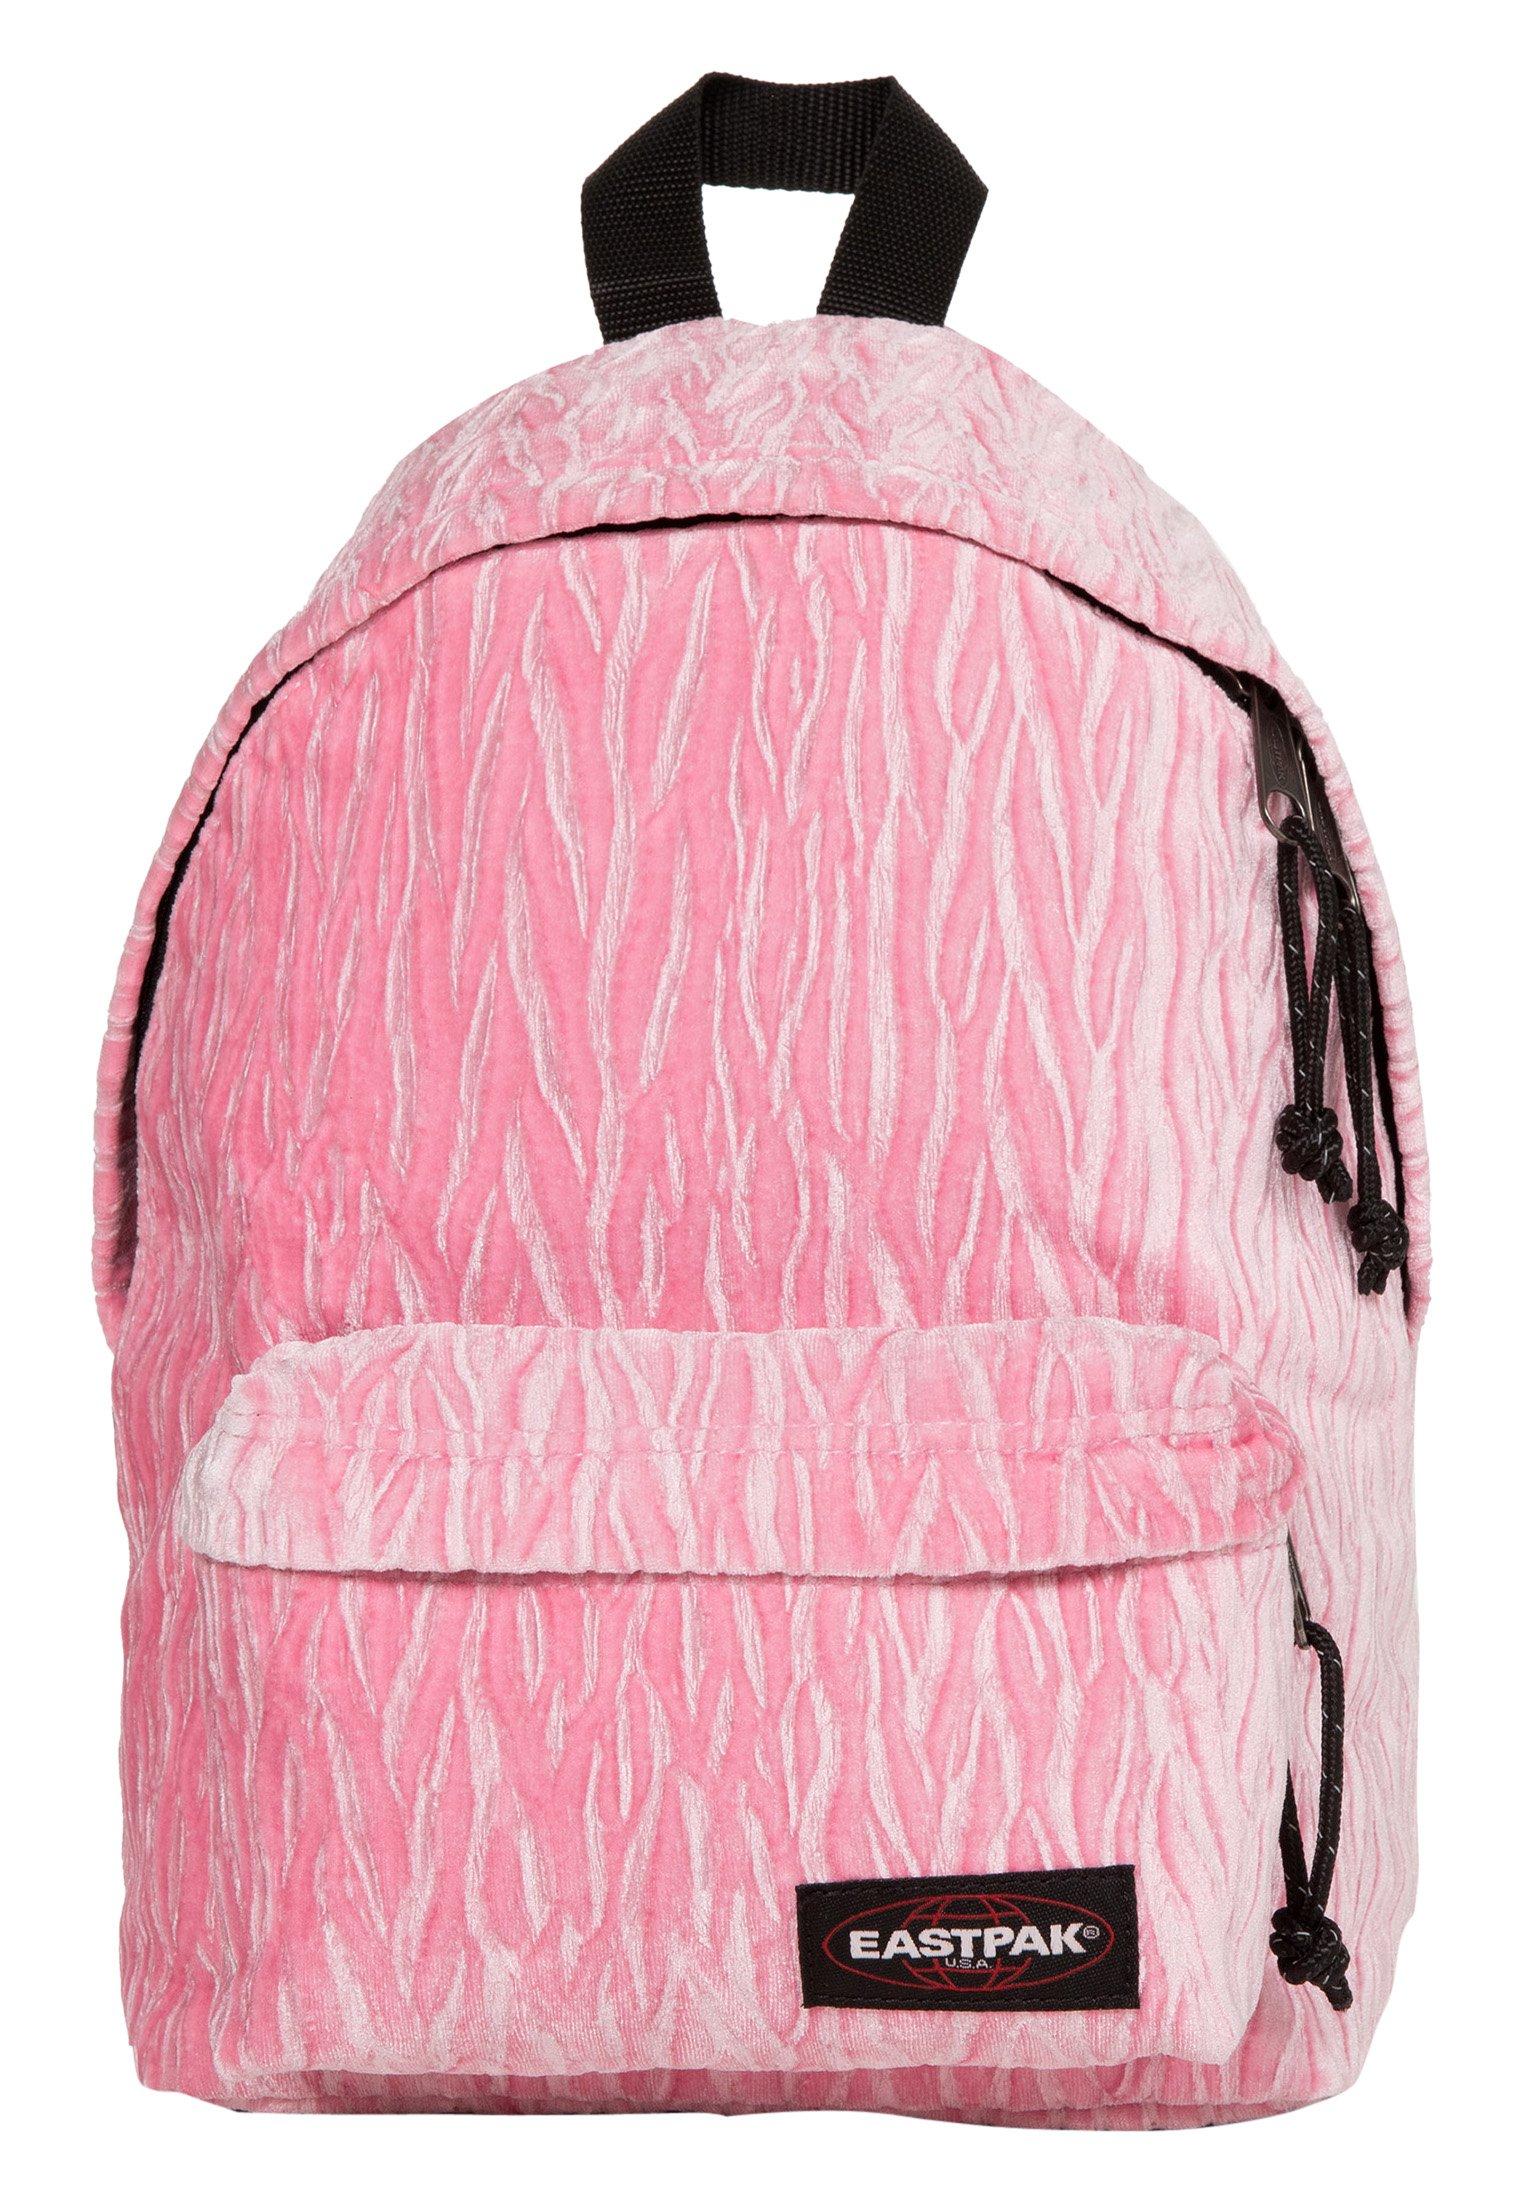 Eastpak Ryggsäck velvet pink Zalando.se